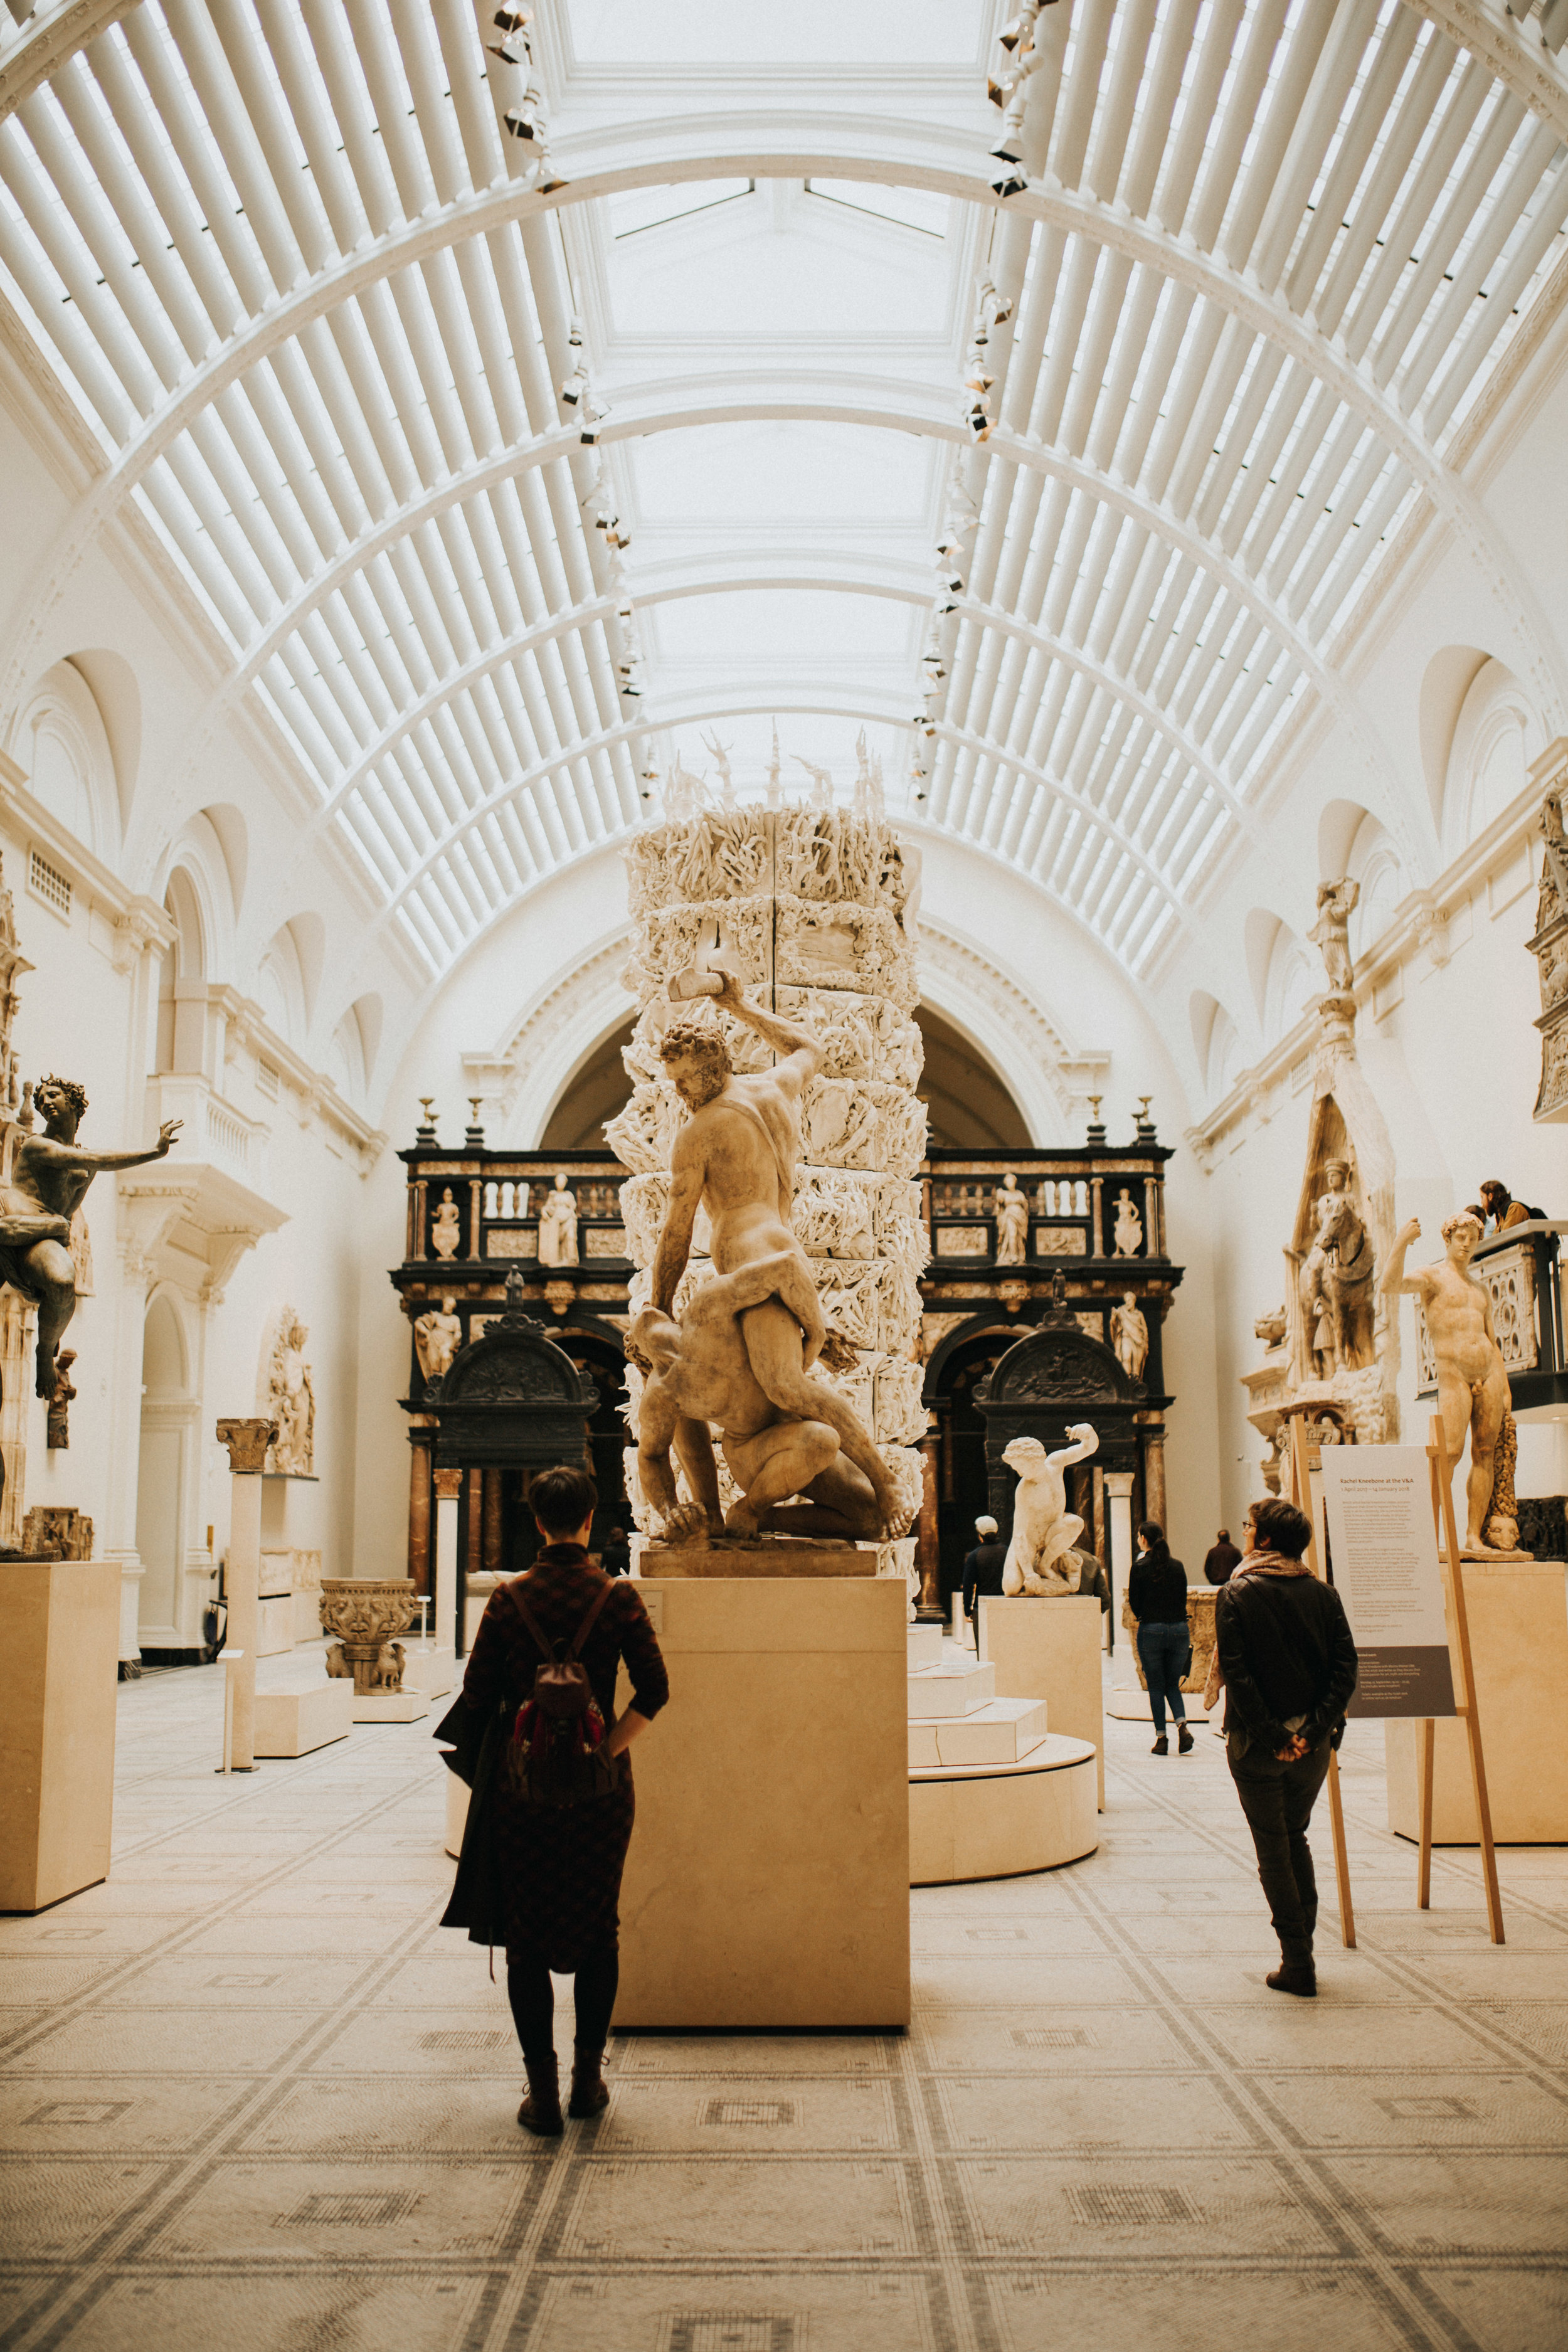 Victoria & Albert Museum - https://www.vam.ac.uk/